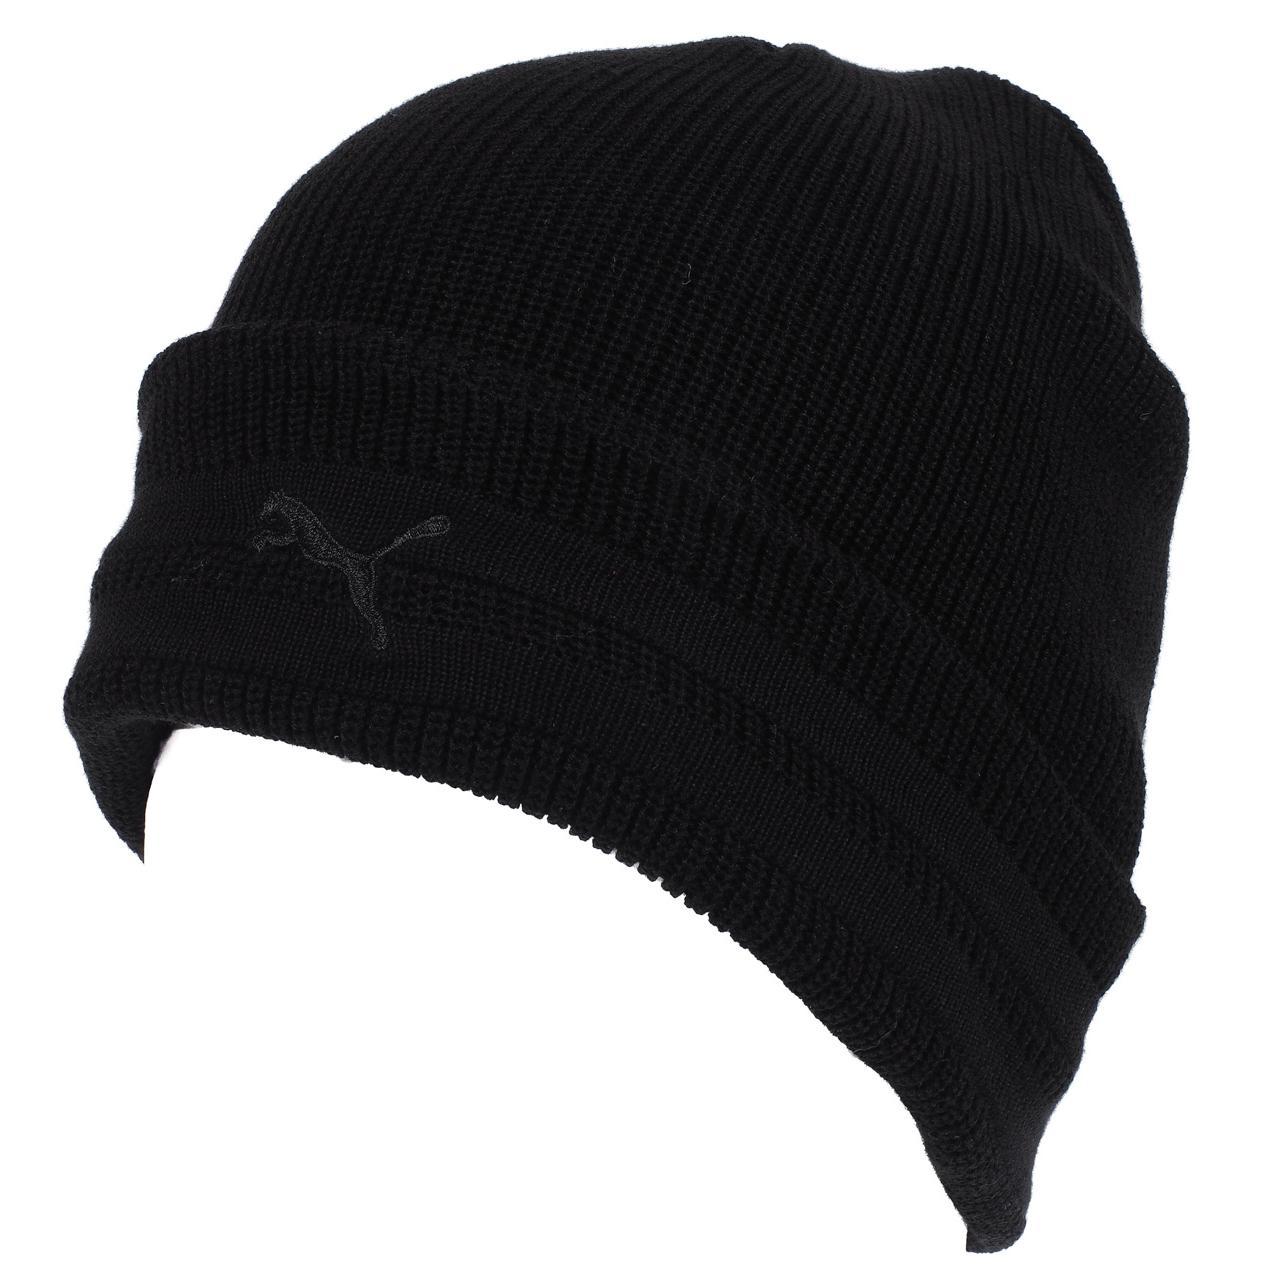 096538762e Bonnet classique Puma Ferrari ls black beanie Noir 58993 - Neuf